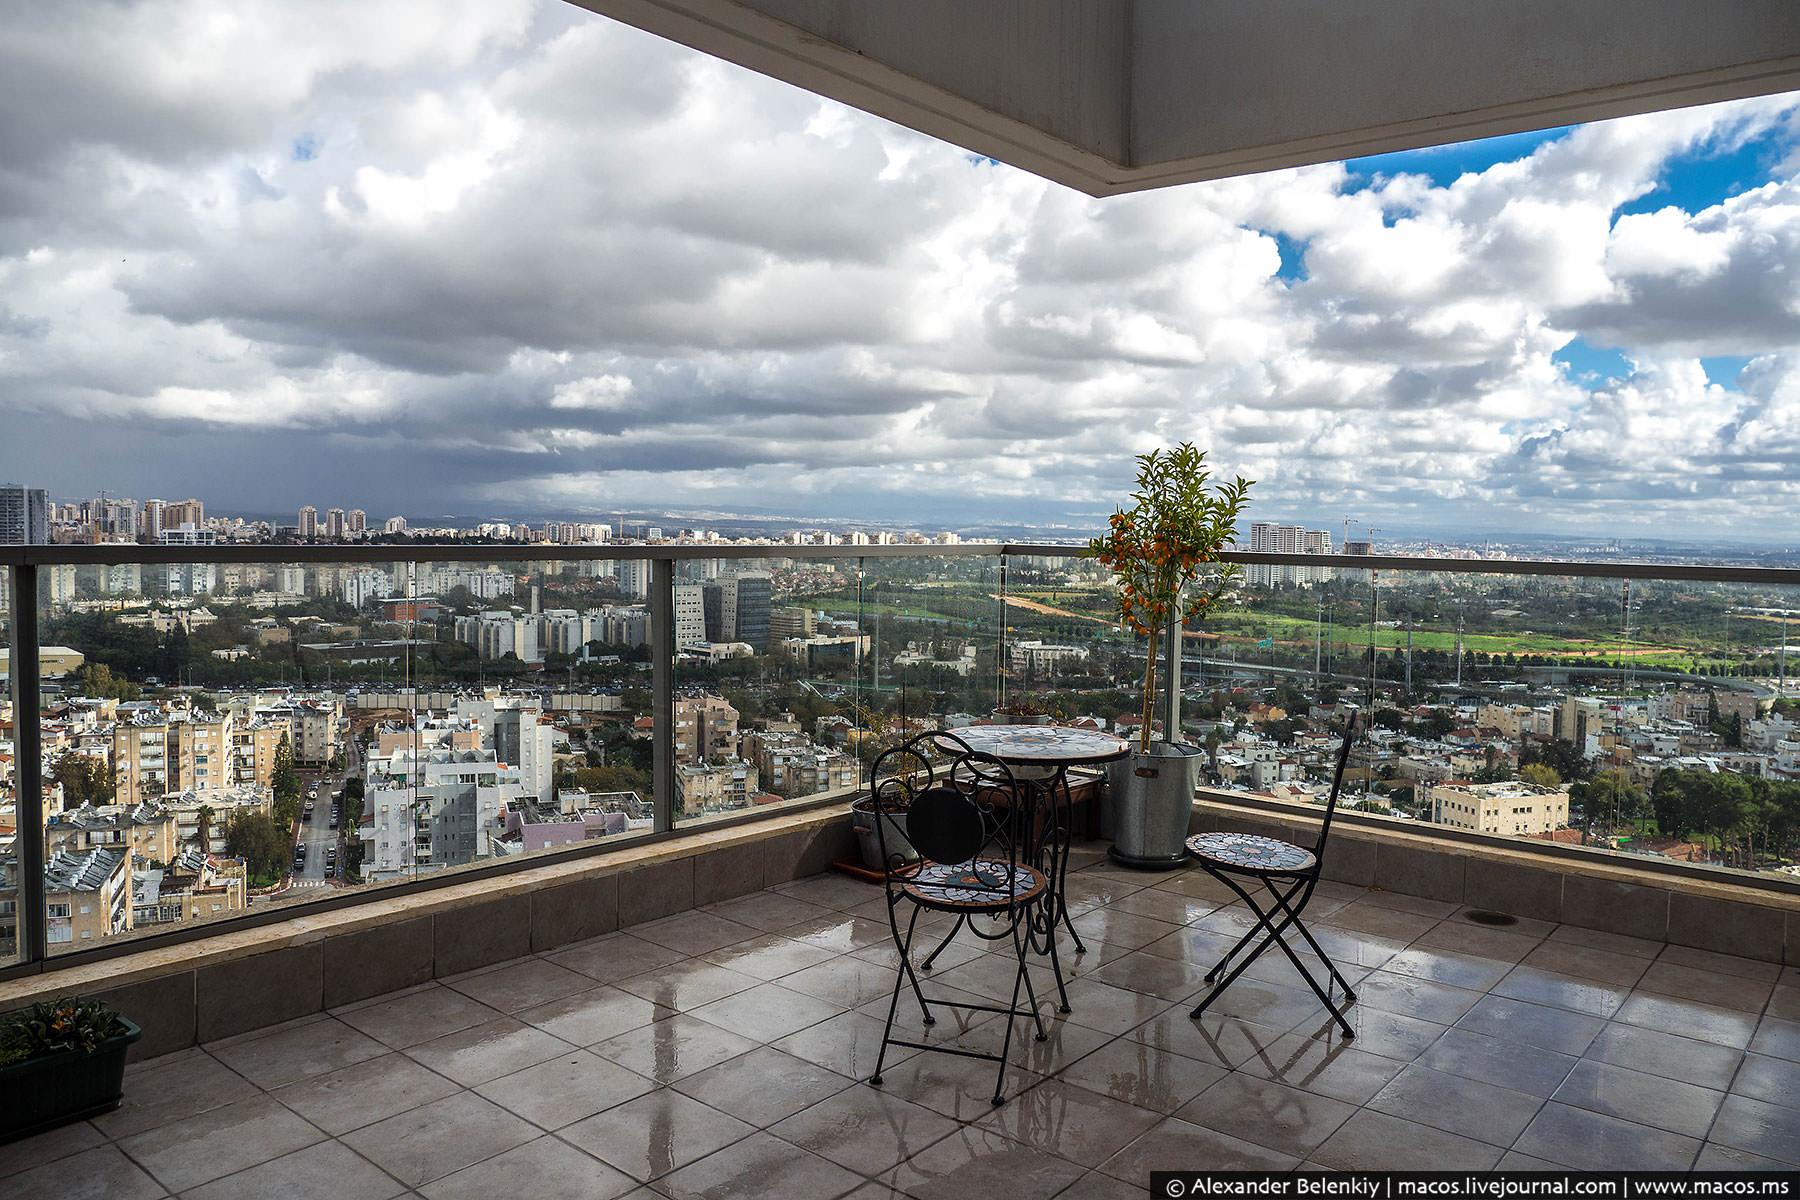 Скромная квартира за миллион долларов. Как живут в Израиле